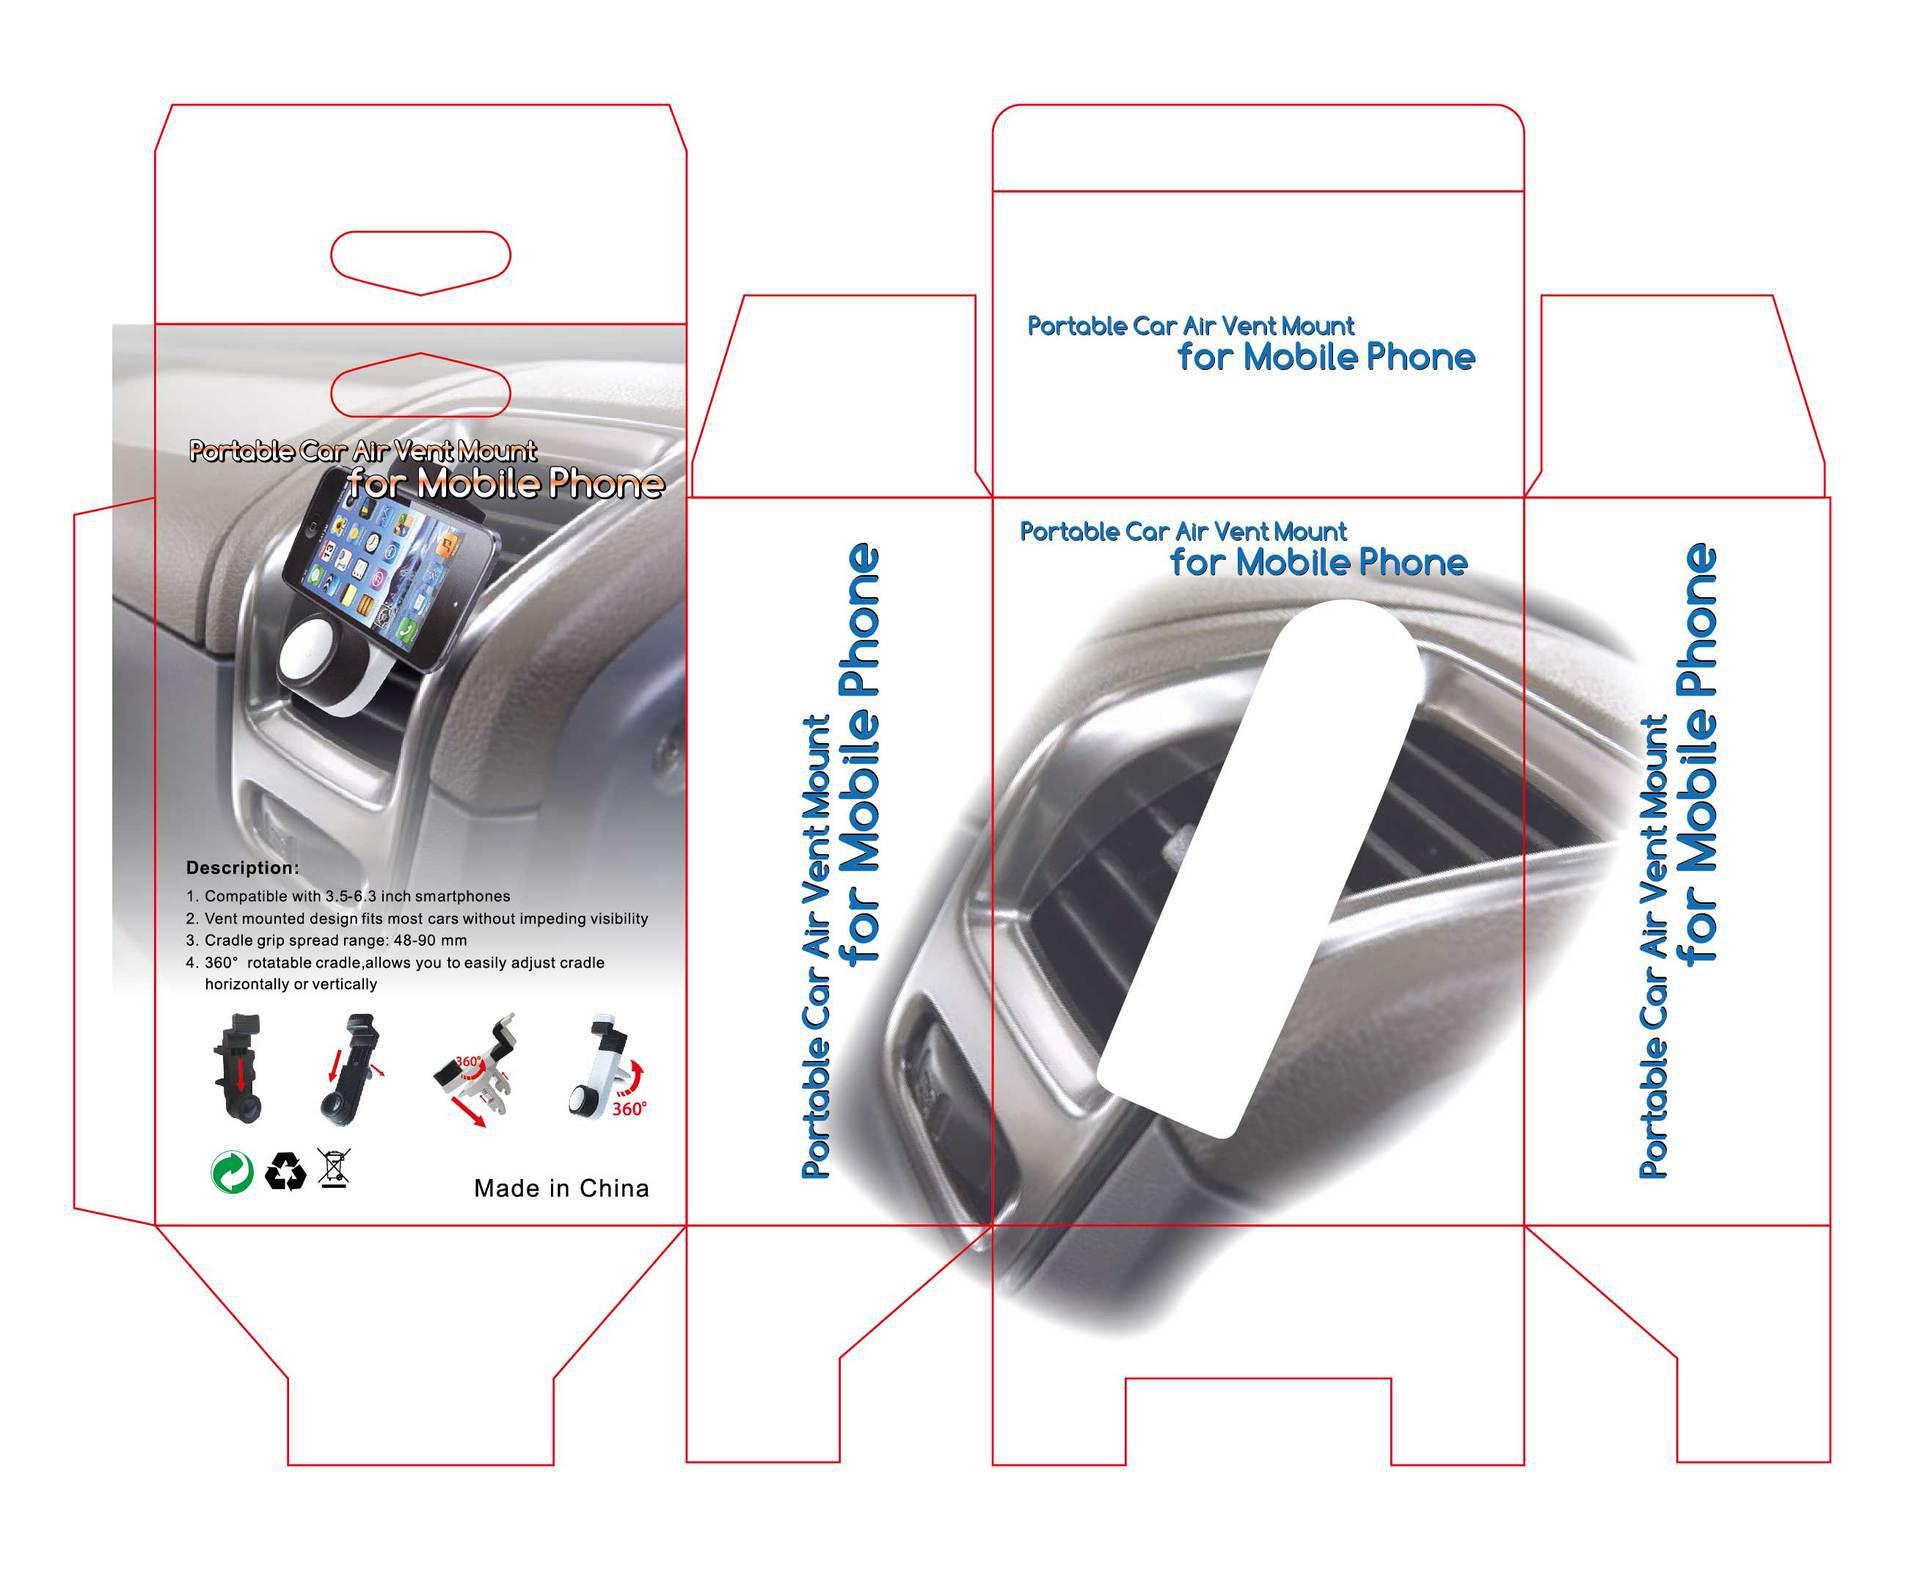 SK226 Portable Car Air Vent Mount Holder for Mobile Phone Similar for Kenu Airframe